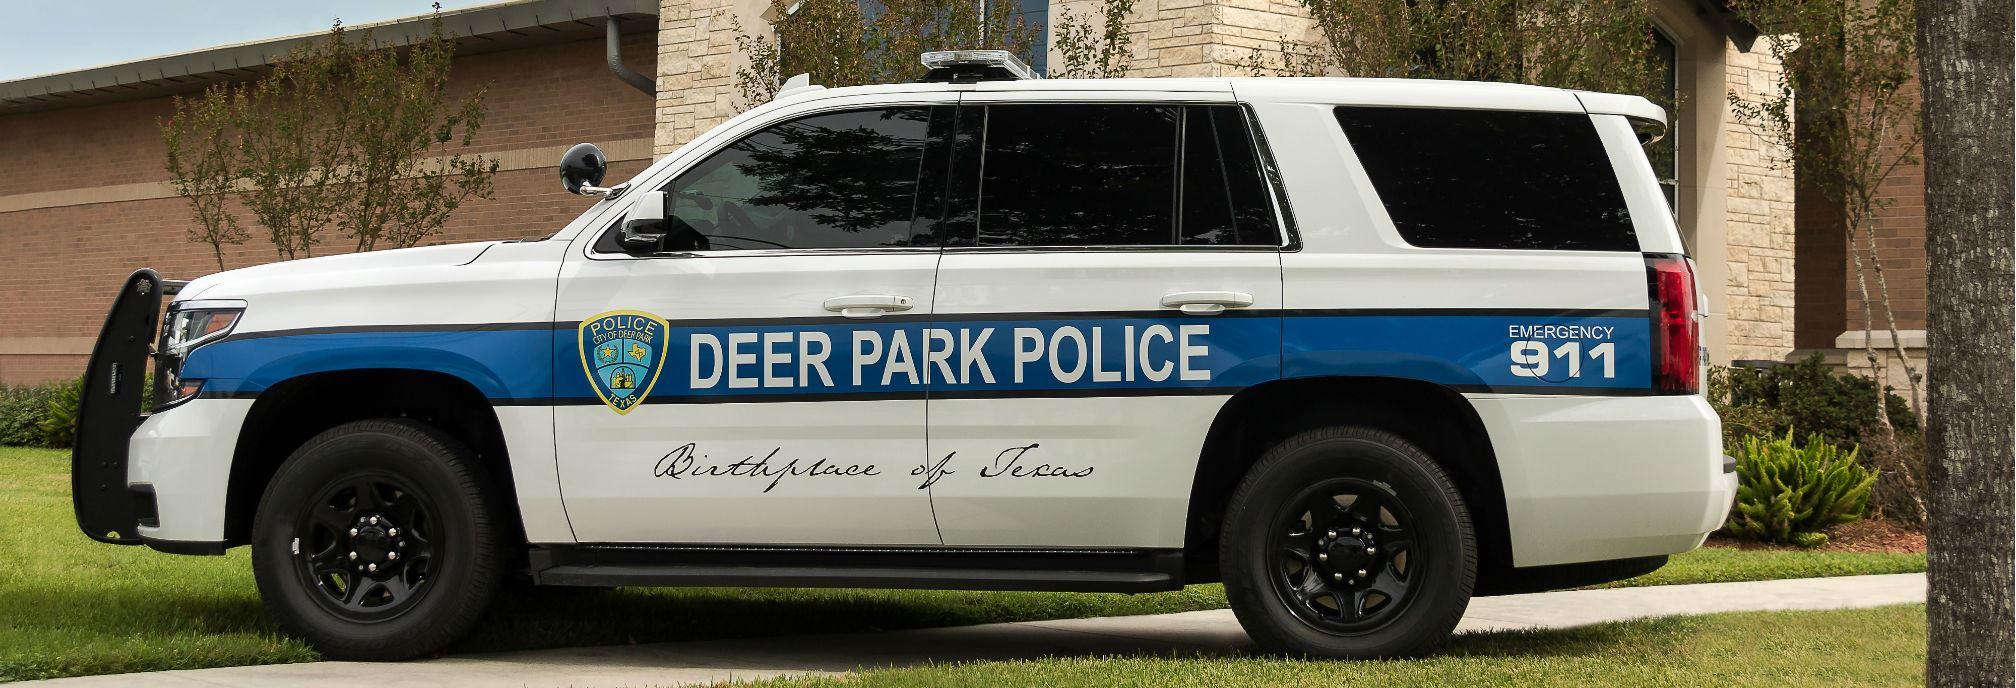 Police   Deer Park, TX - Official Website